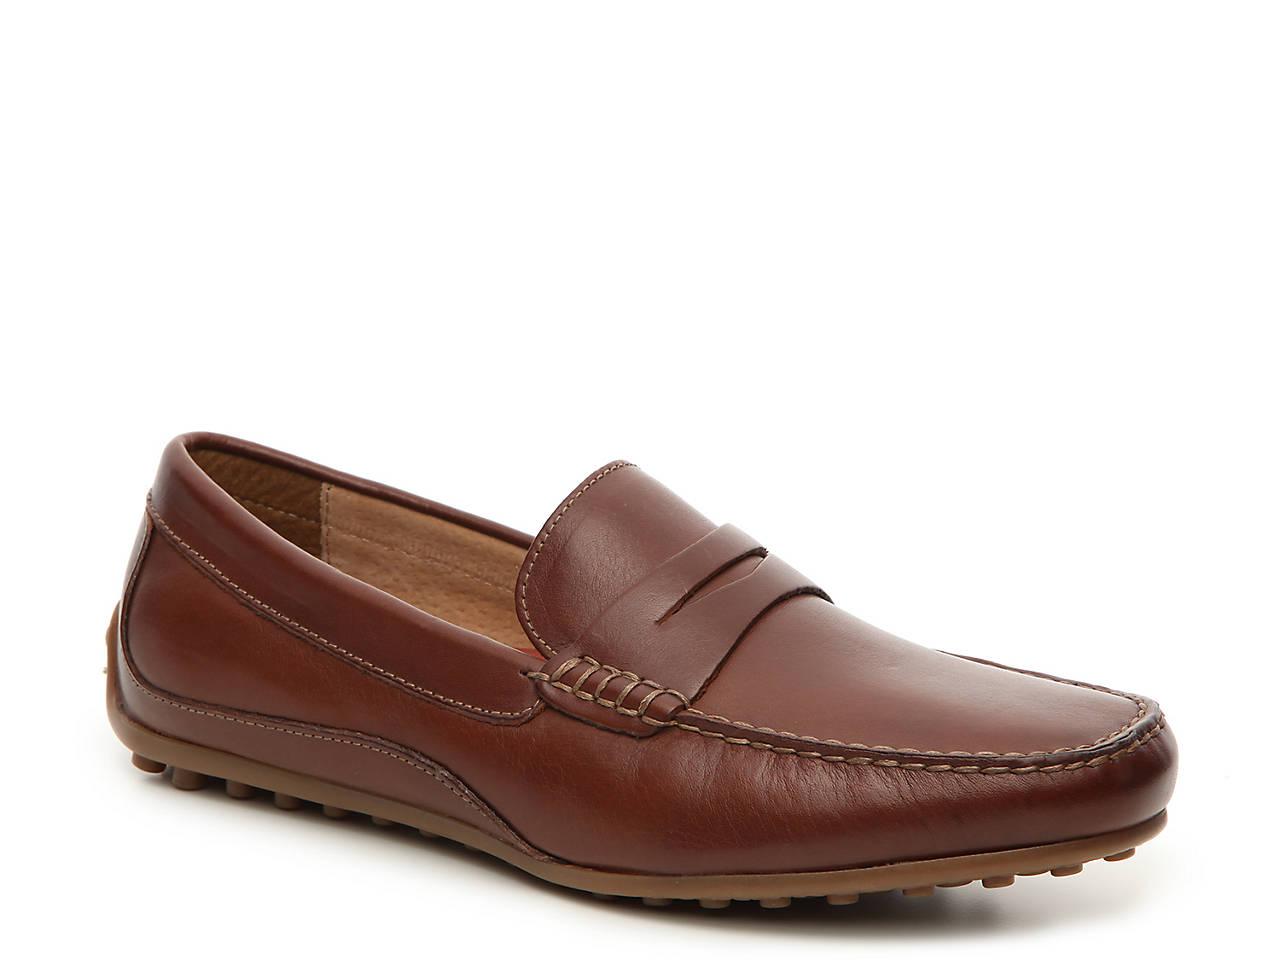 a708e957c75 Florsheim Oval Penny Loafer Men s Shoes